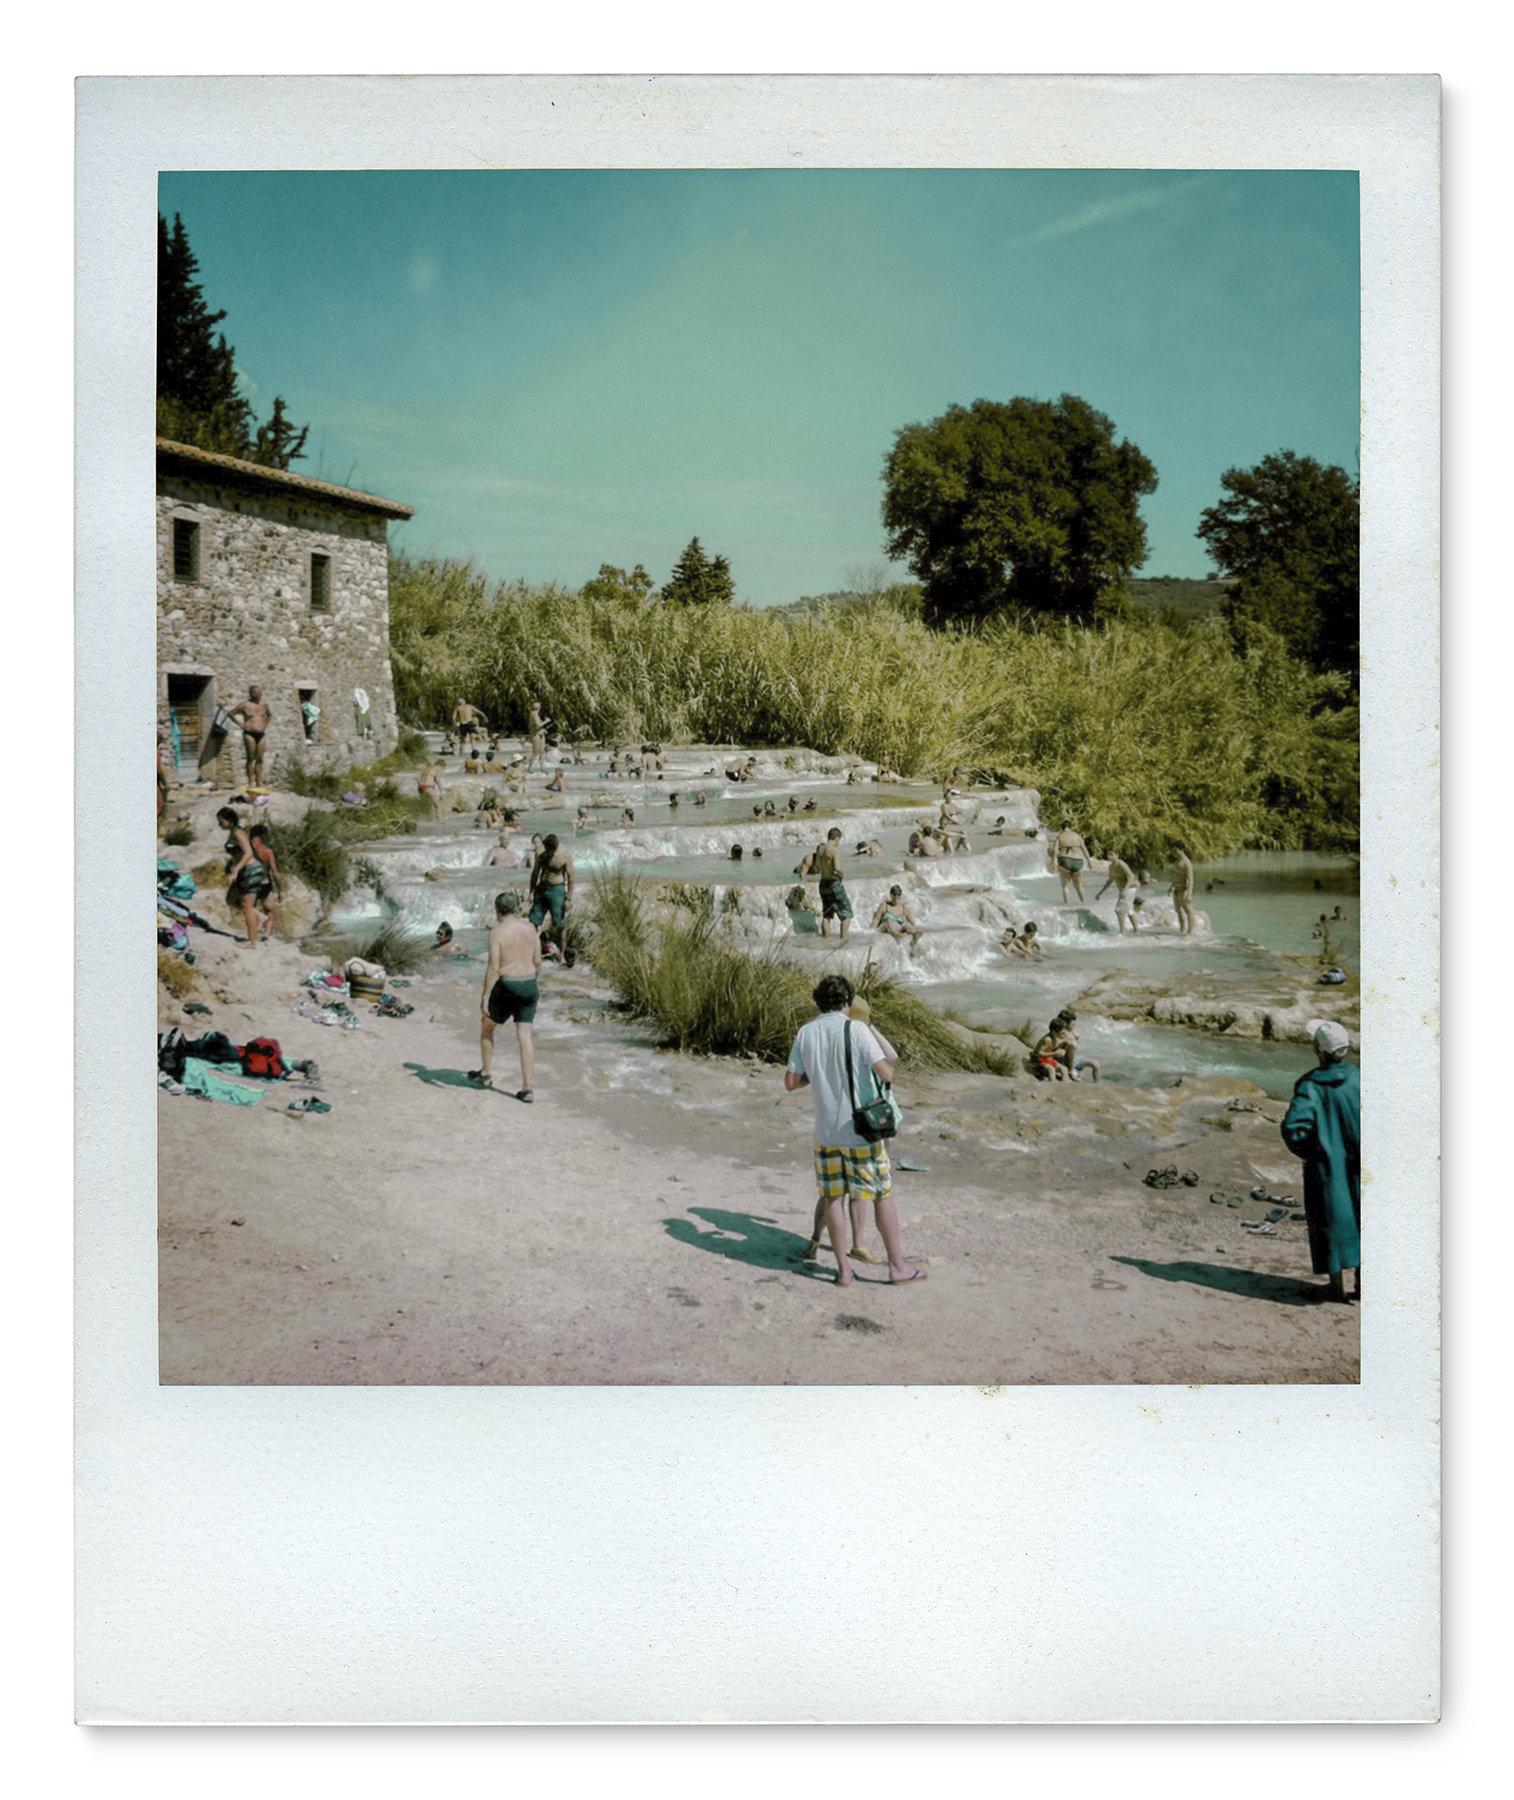 004_Polaroid SX70_IMG_2282.jpg